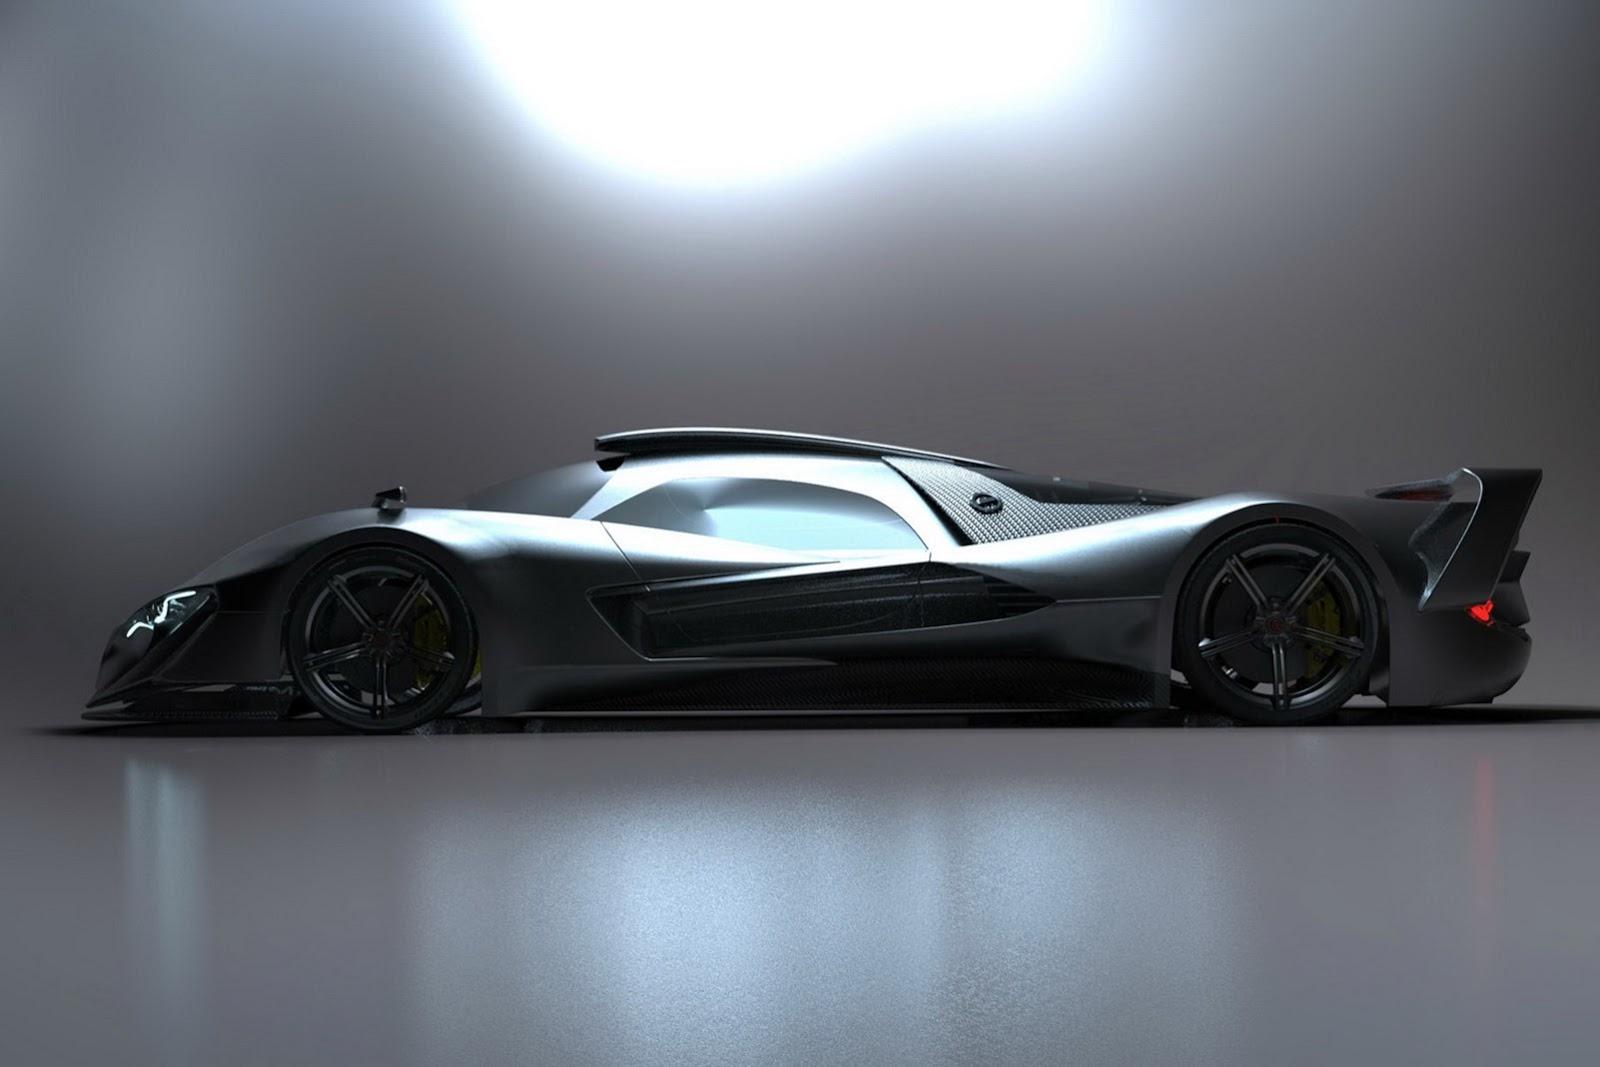 Mercedes Supercar 2016 (Mark Hostler)